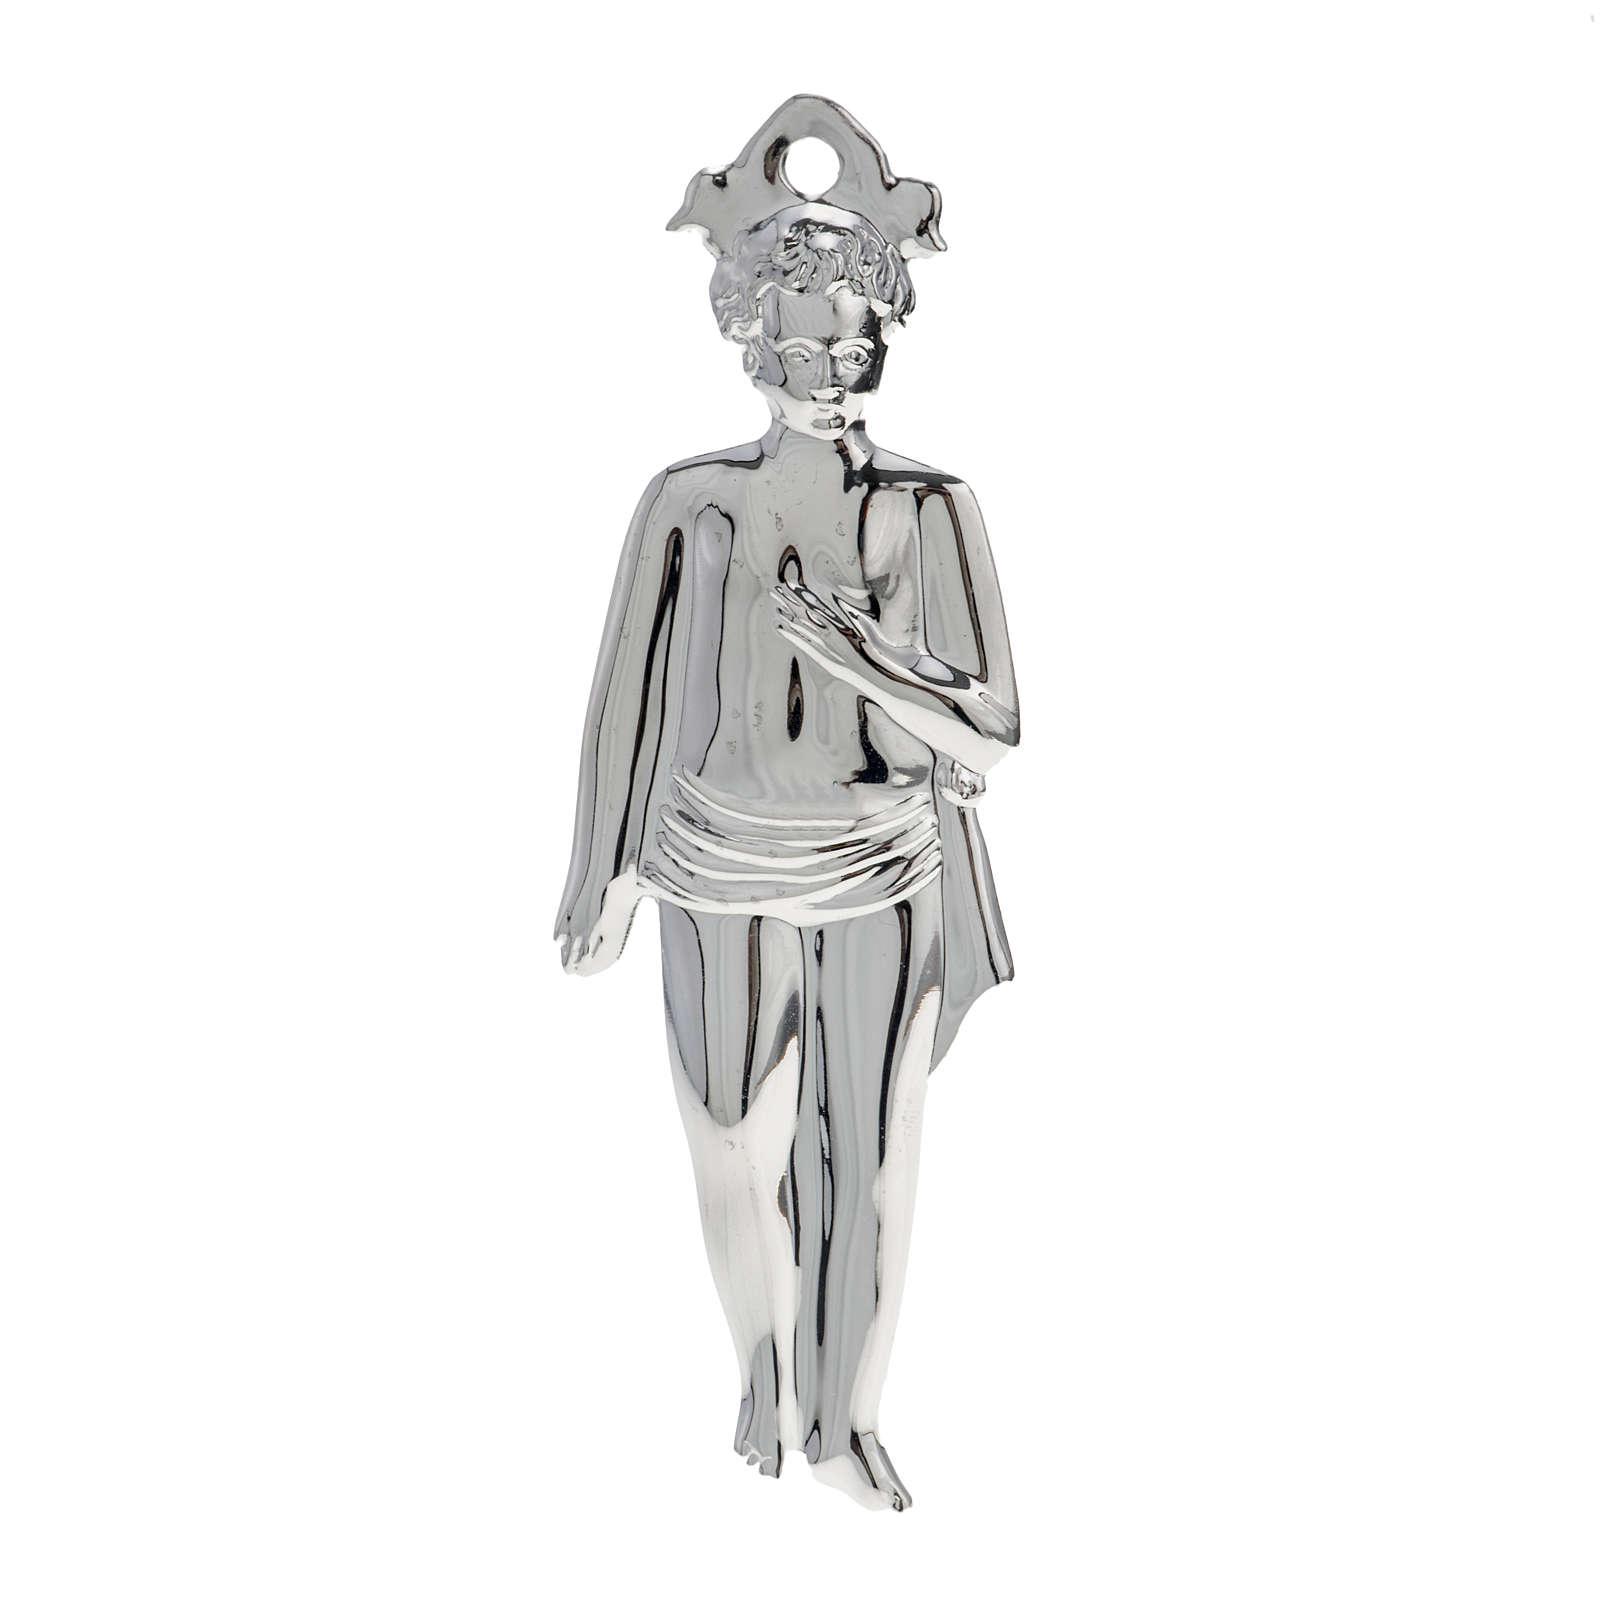 Ex voto bambino argento 925 o metallo 15 cm 3